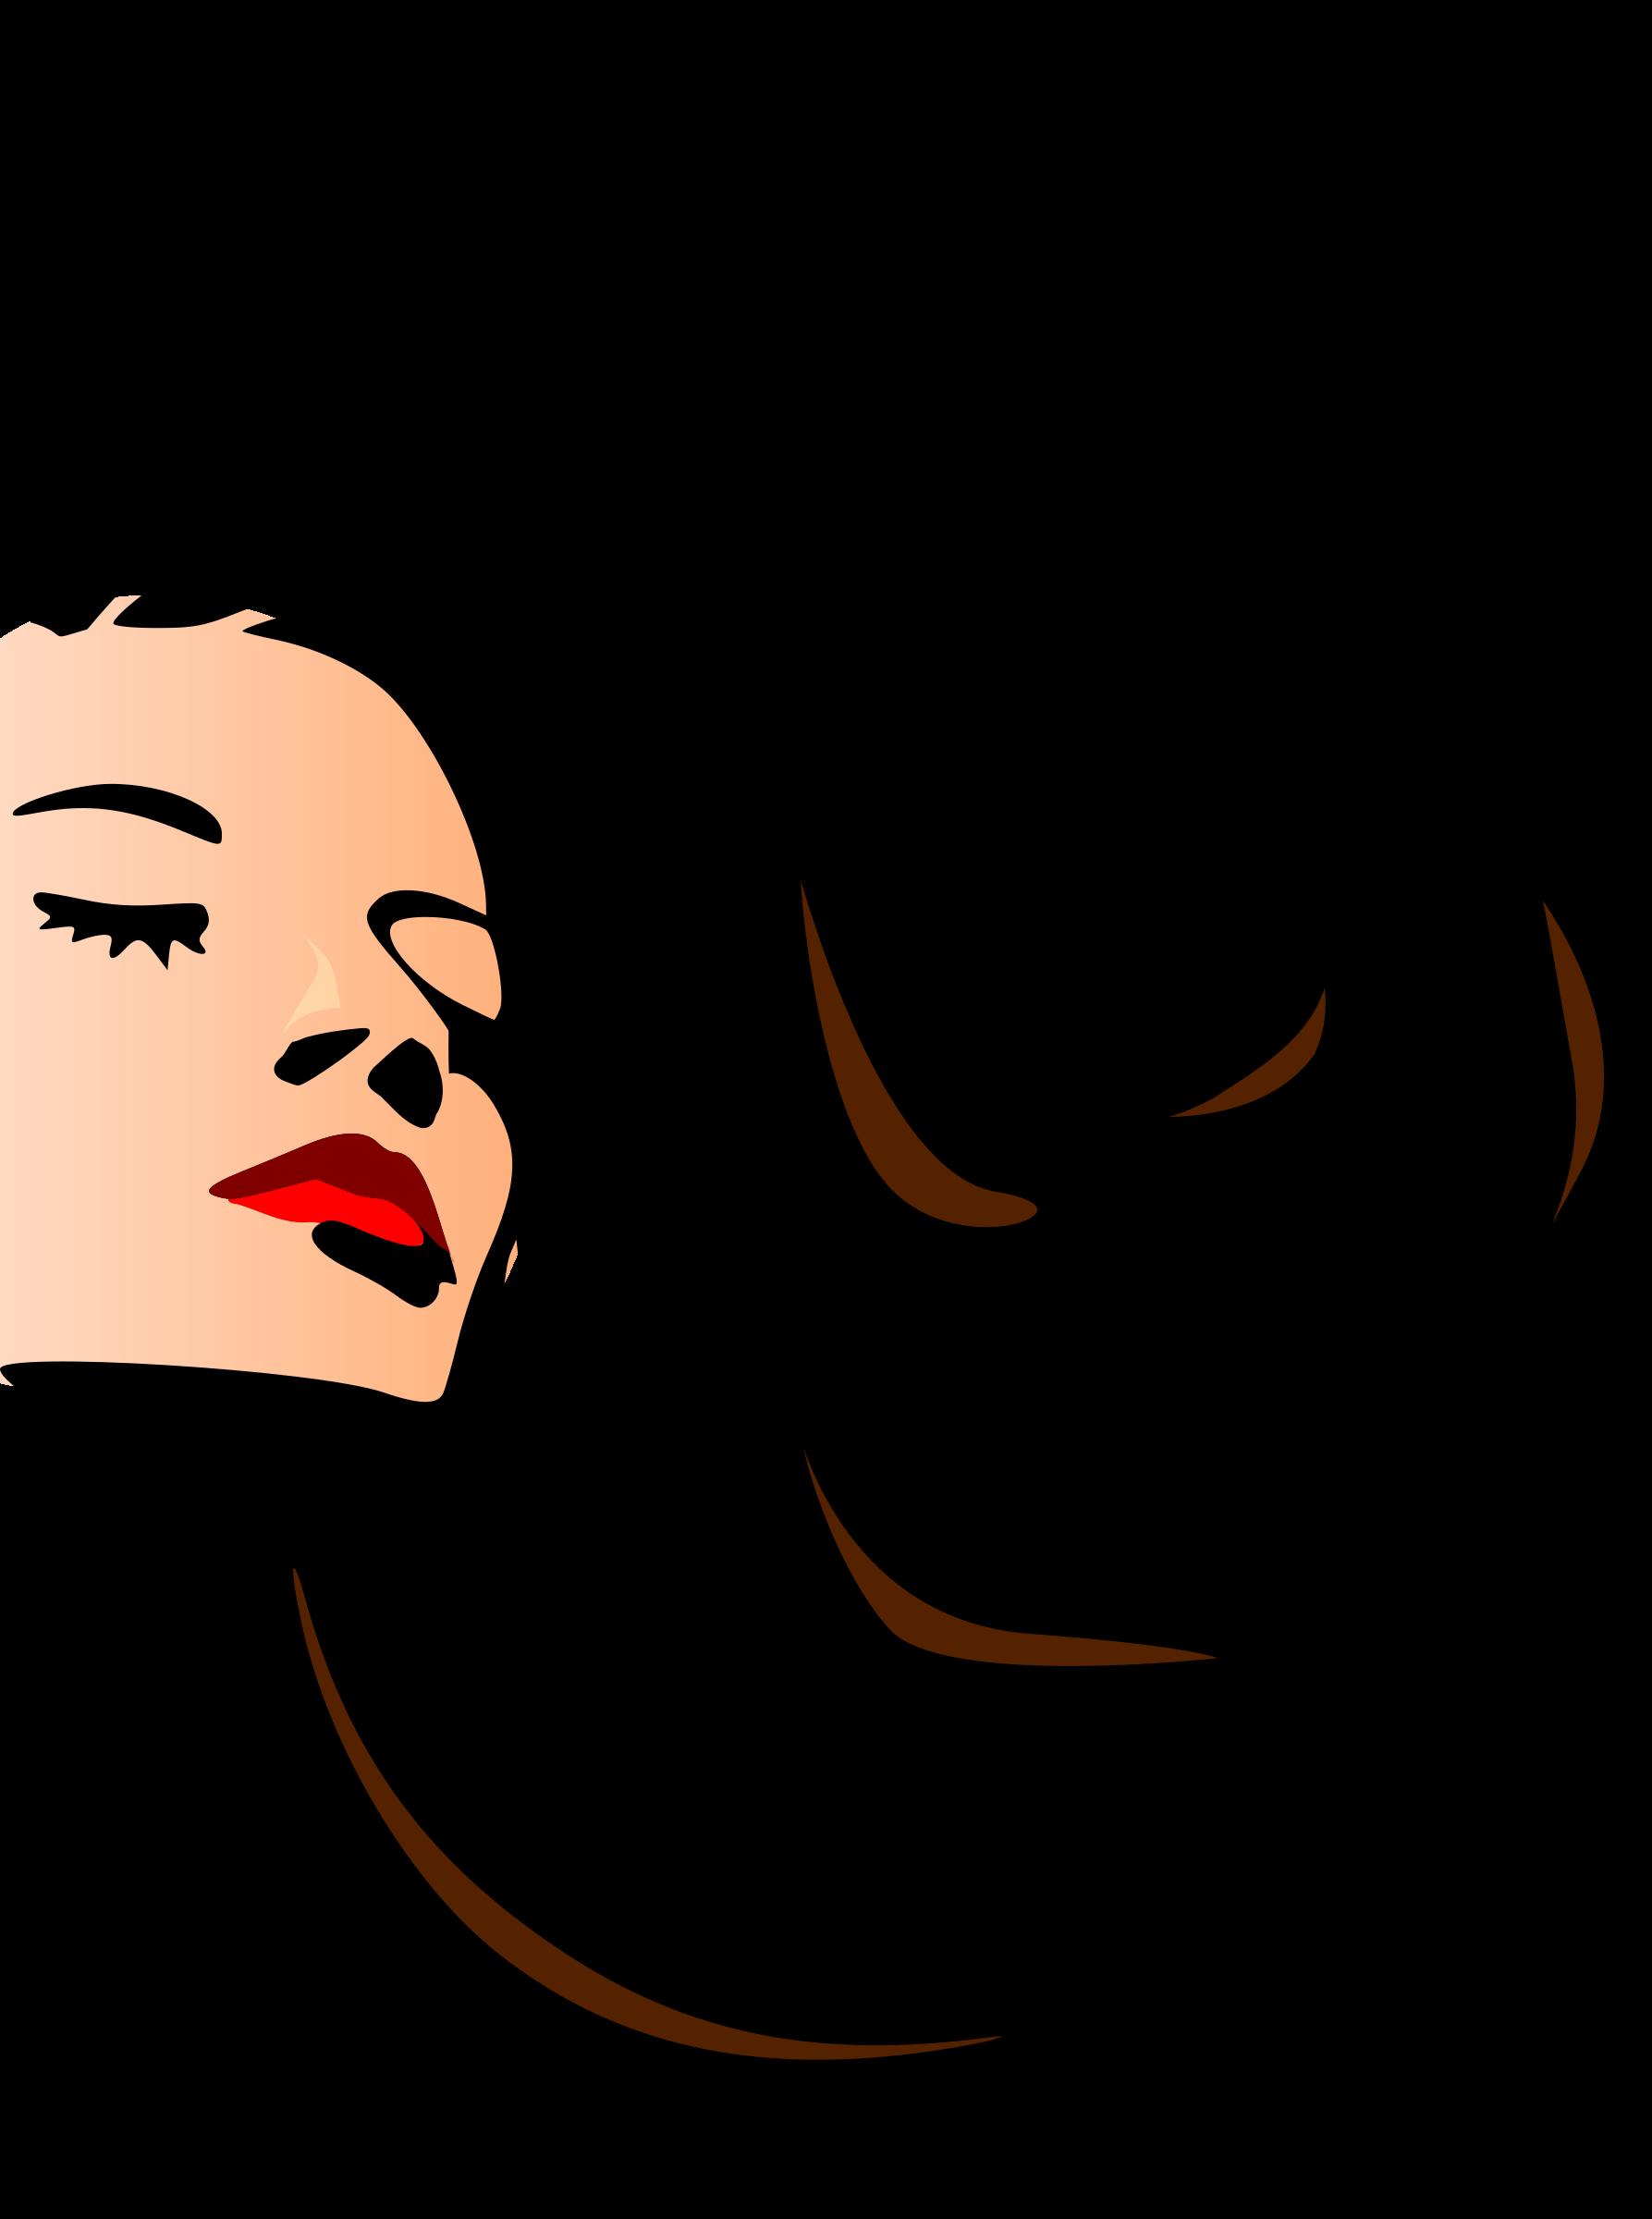 Hair clipart cartoon BIG Clipart woman (PNG) IMAGE